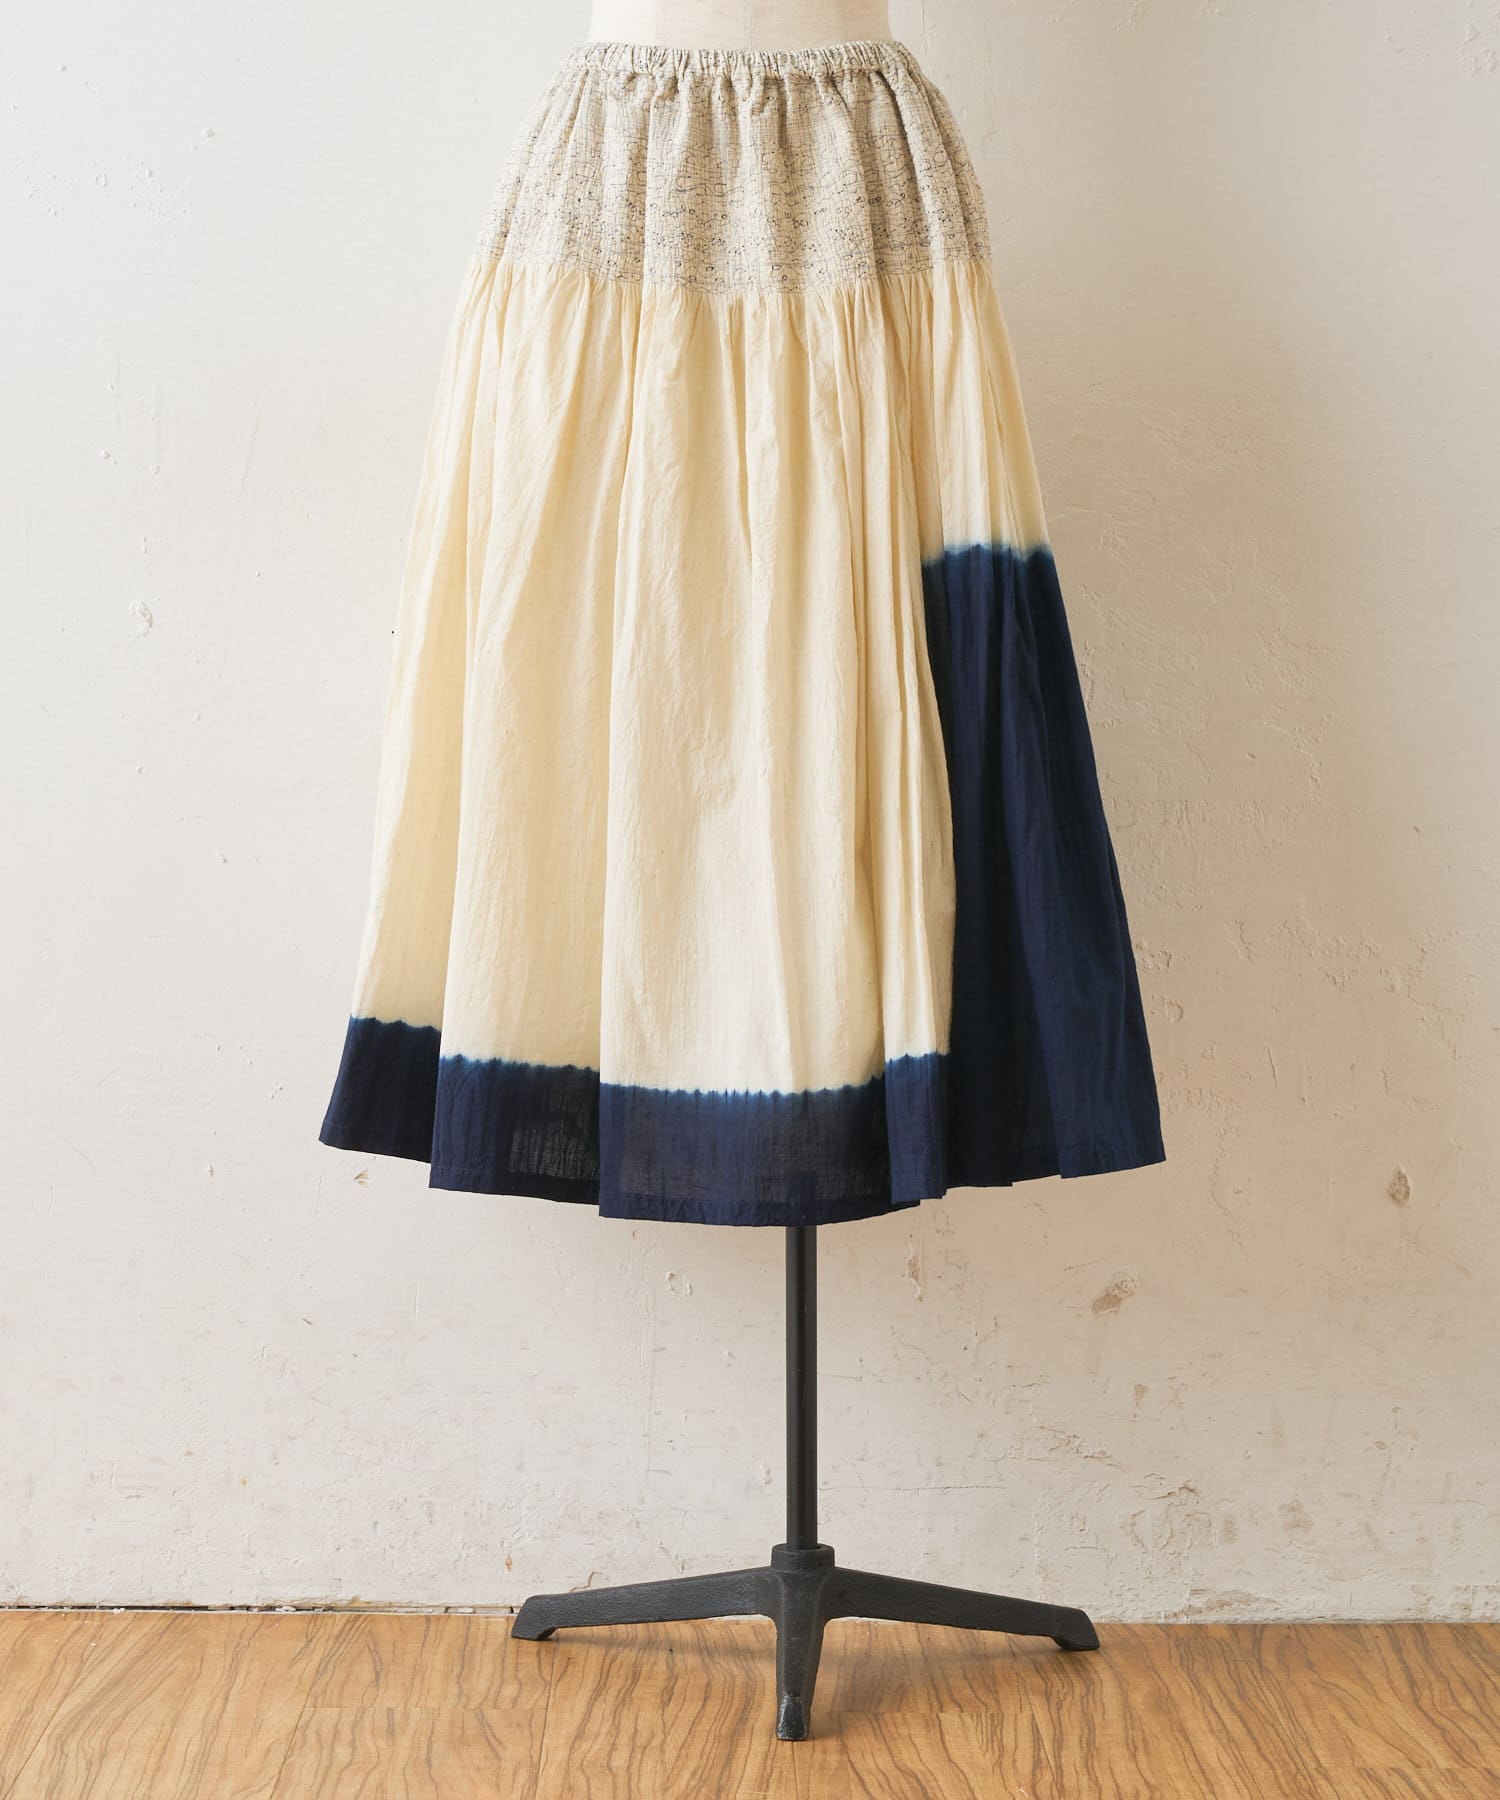 BEARDSLEY(ビアズリー) 《INJIRI》ギャザースカート